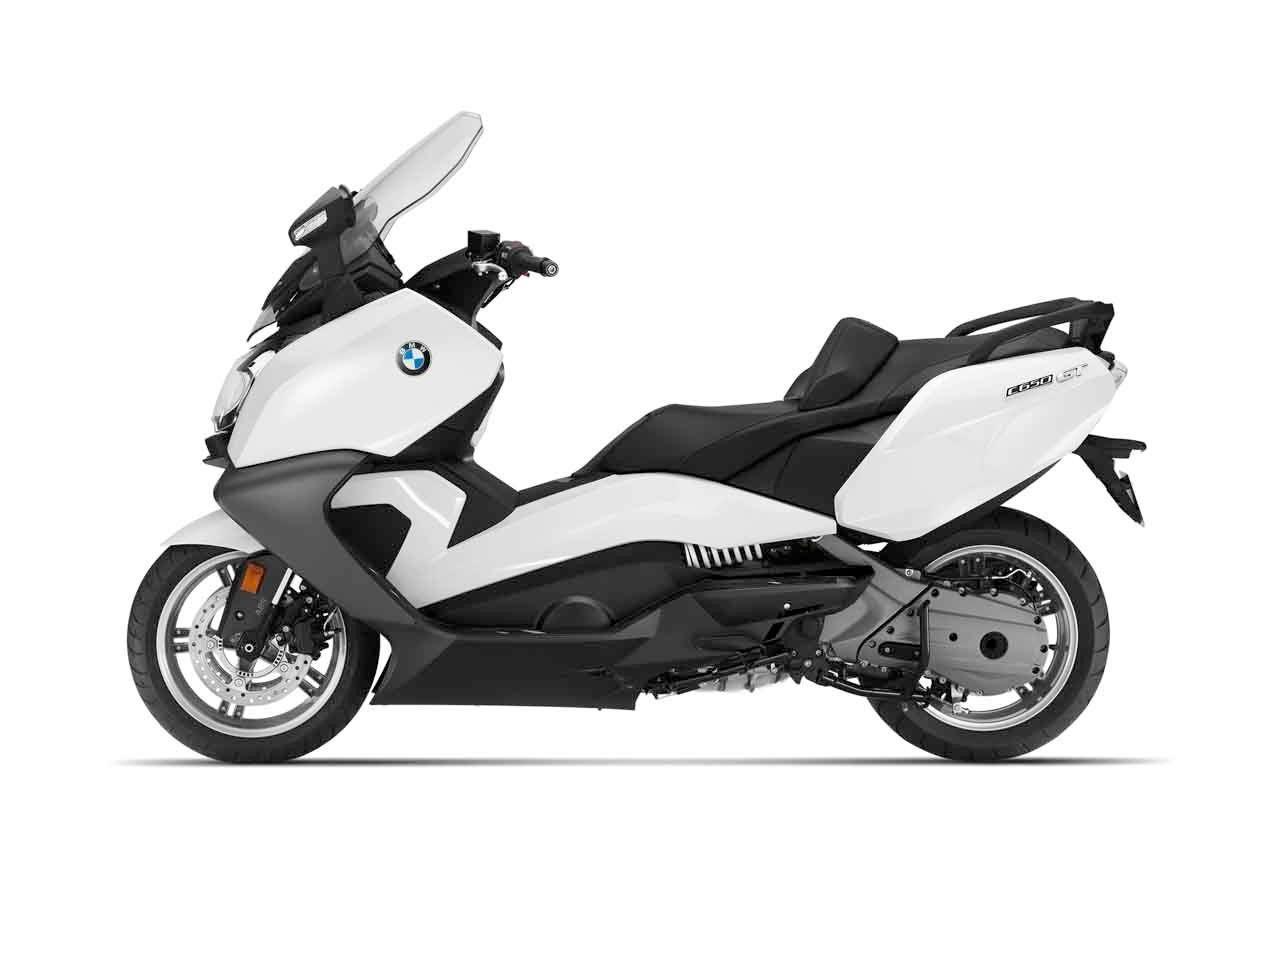 motorrad neufahrzeug kaufen bmw c 650 gt abs arrigoni sport gmbh adliswil. Black Bedroom Furniture Sets. Home Design Ideas